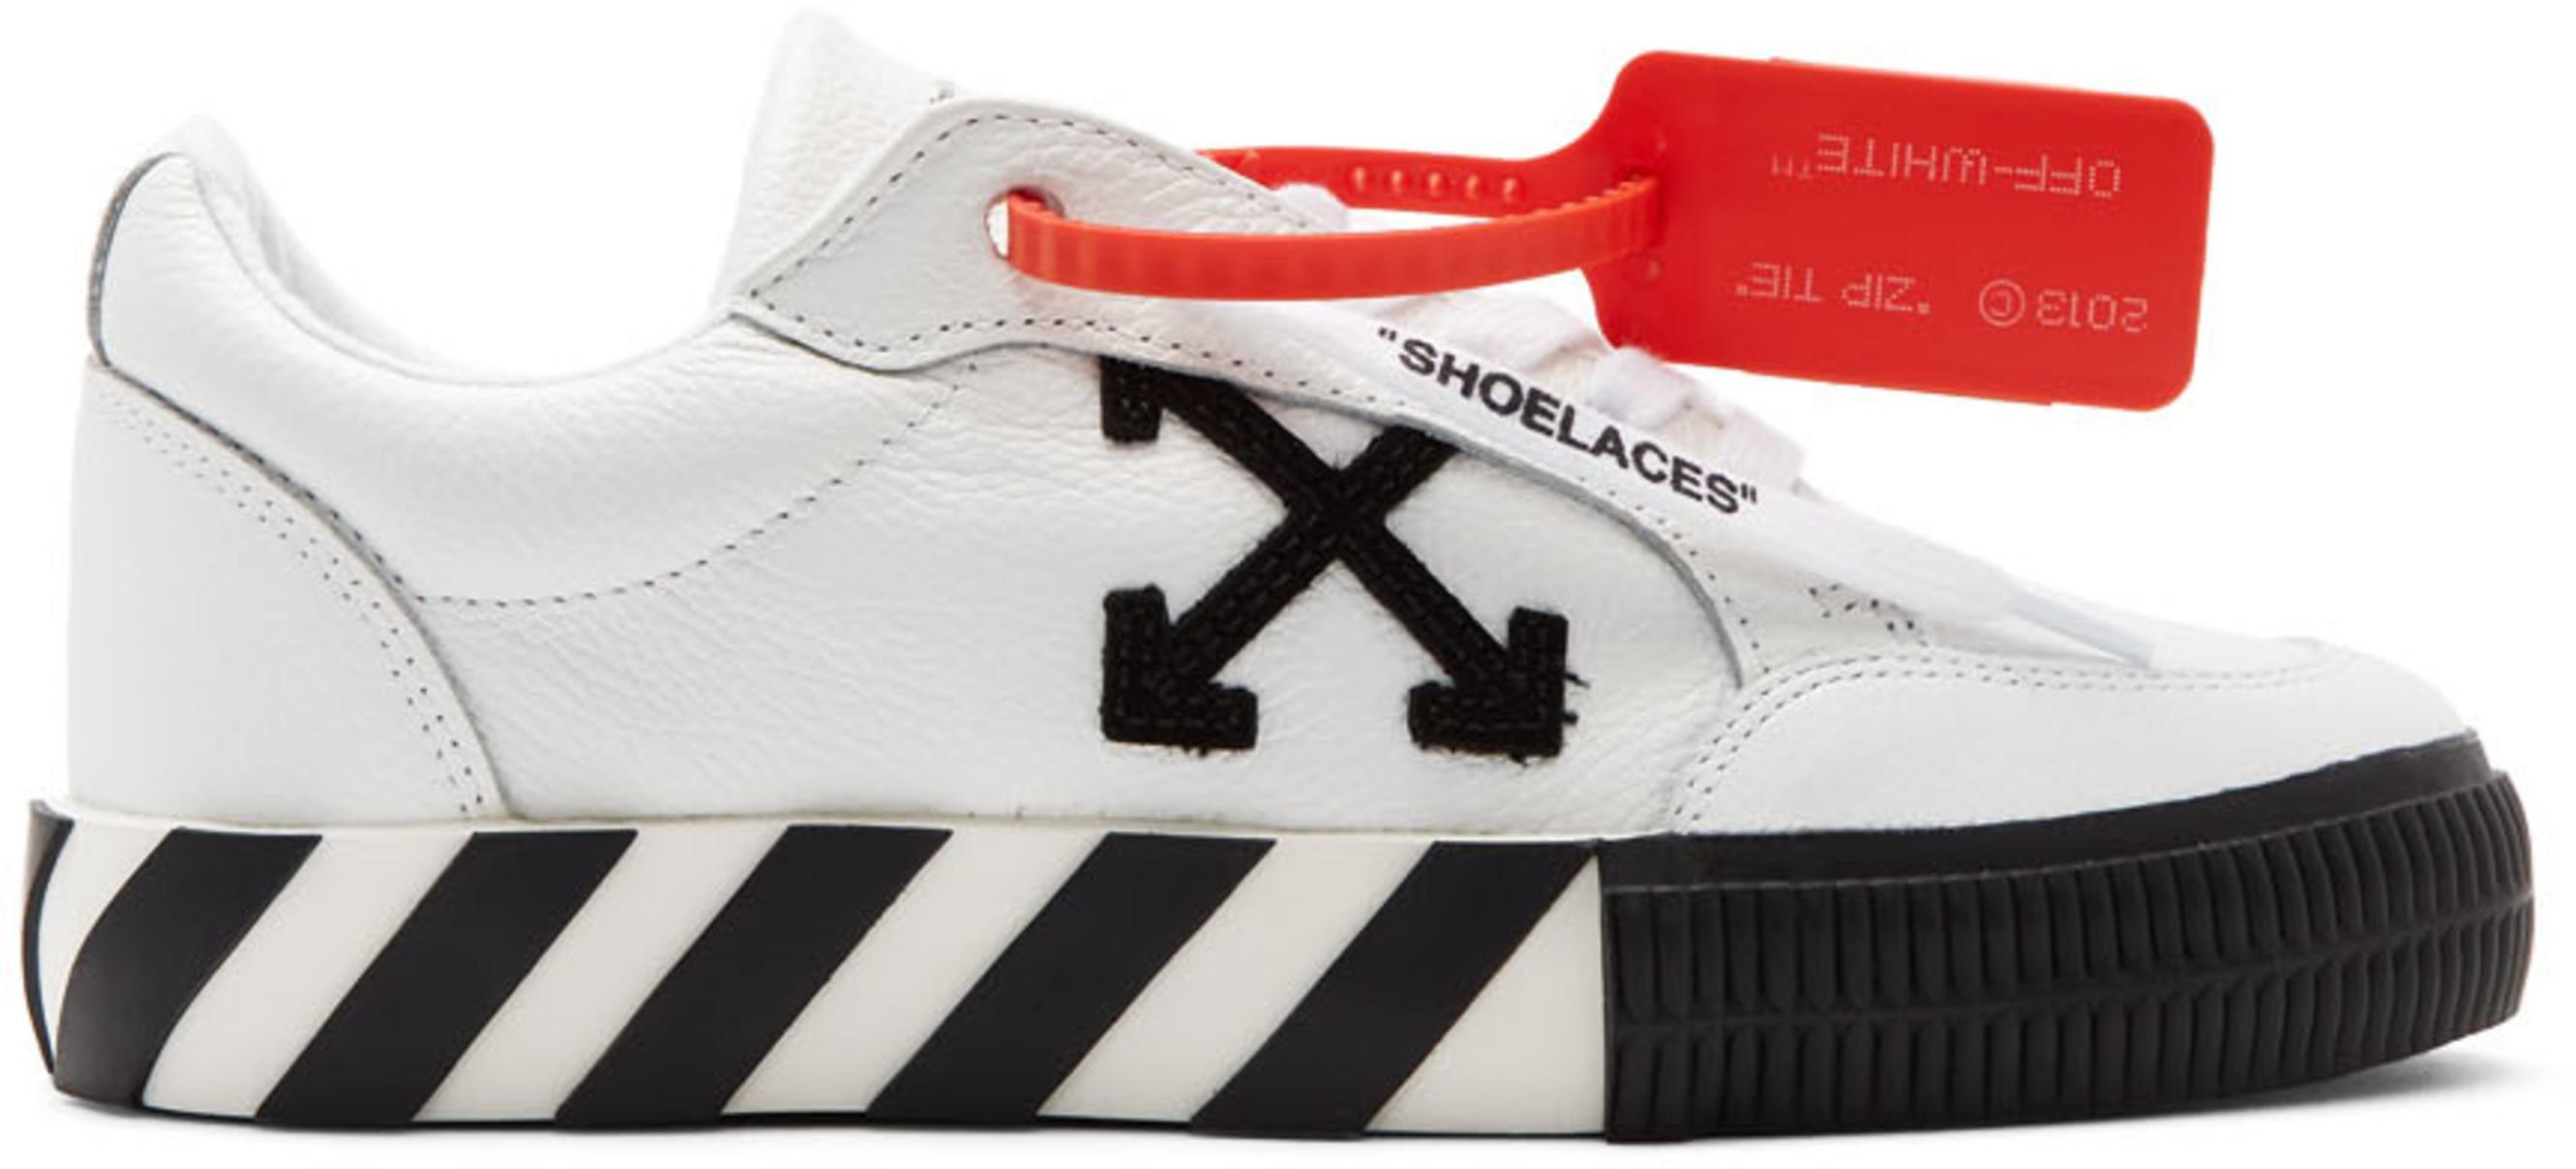 distribuidor mayorista 5984d 40d80 White Arrow Low Vulcanized Sneakers